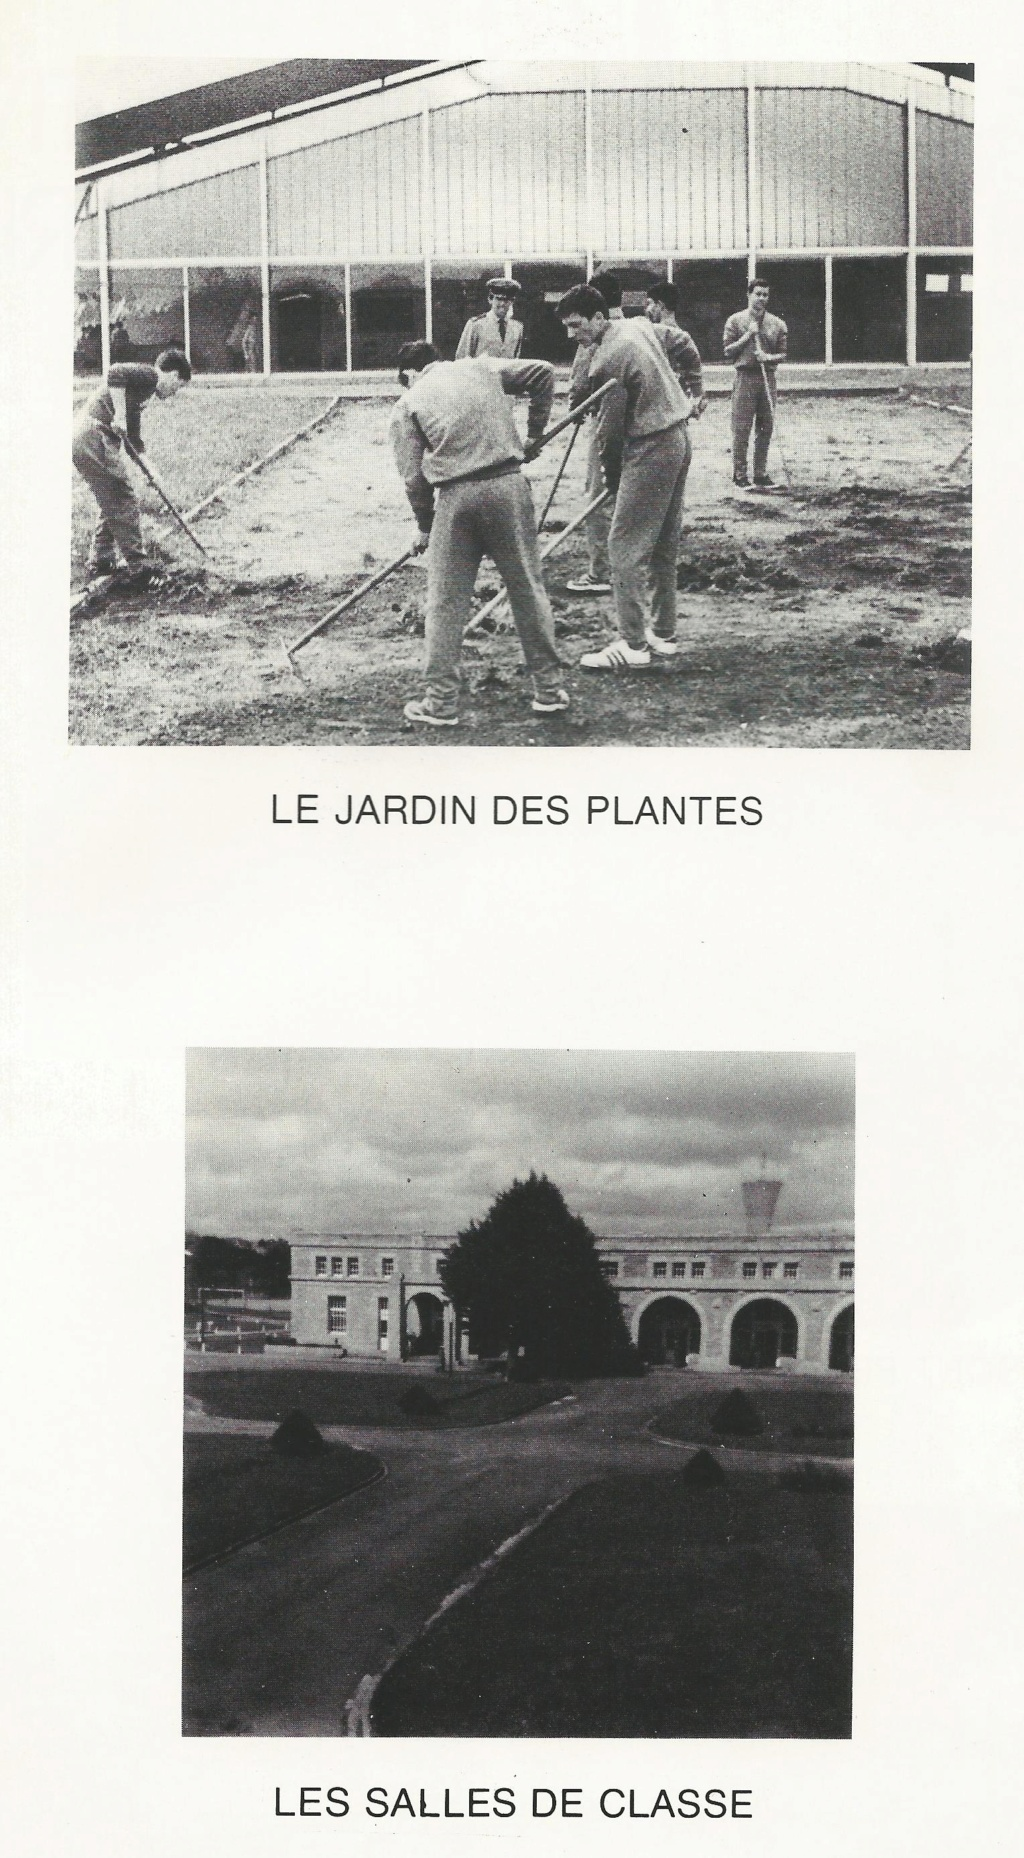 [ École des Mousses ] École des mousses 76/77 Mousse18